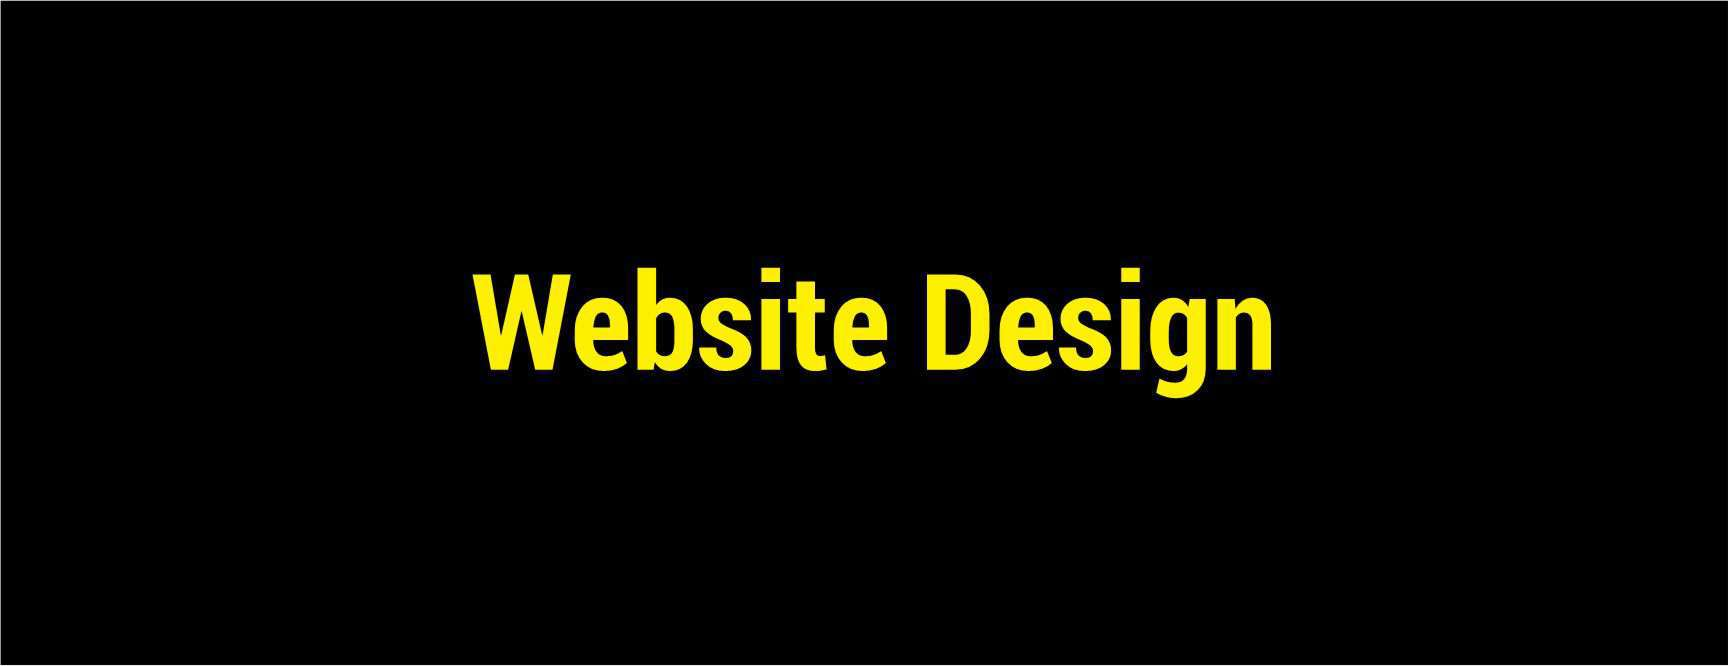 website deisgn(FILEminimizer)